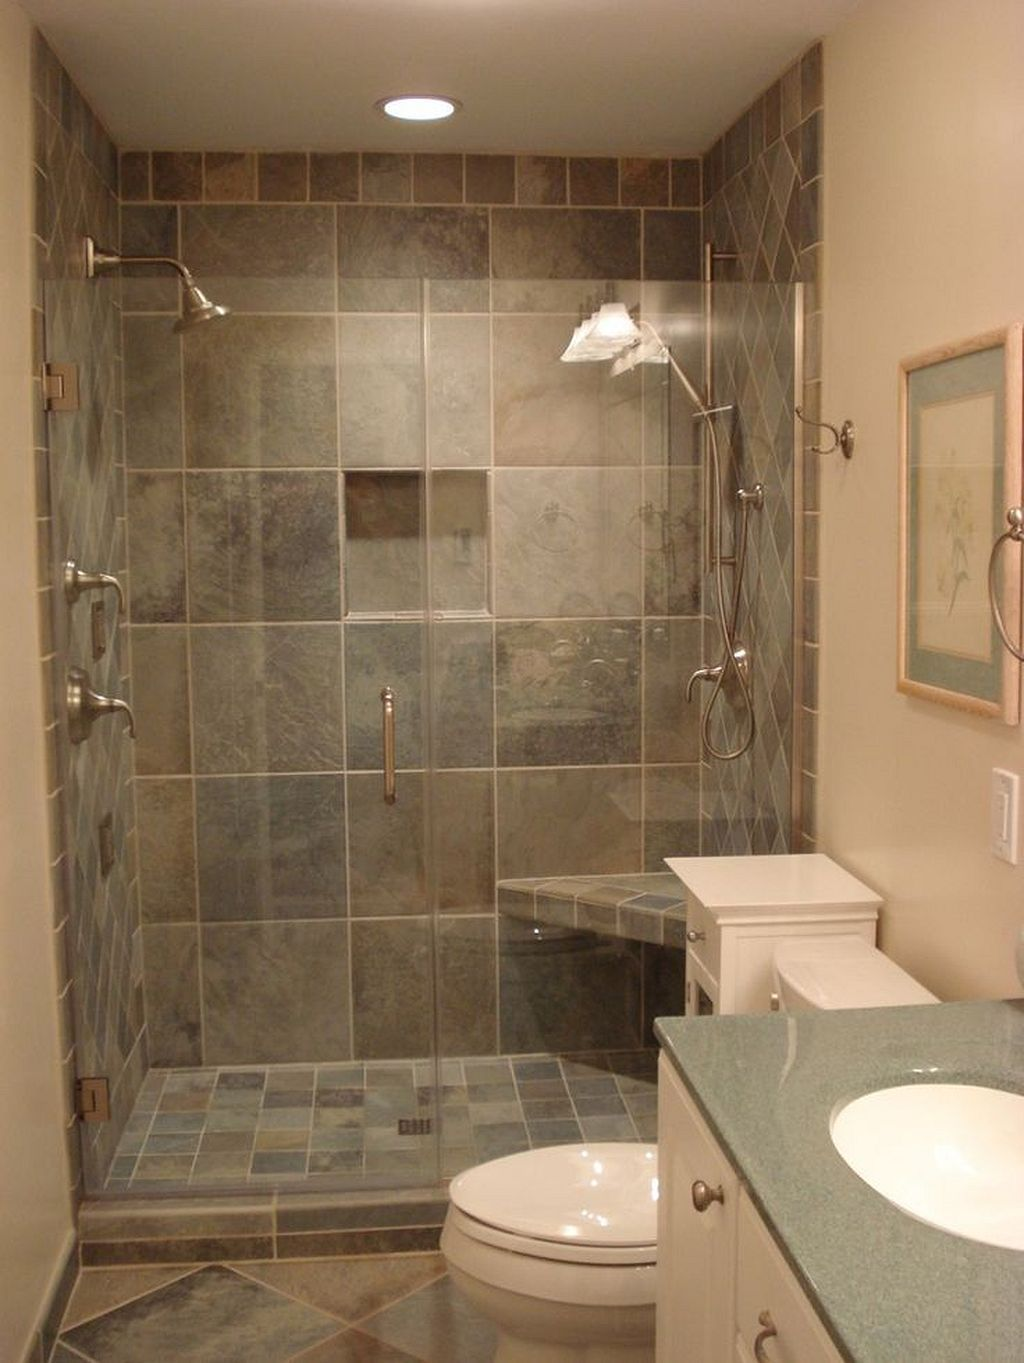 Images Of Bathroom Remodels